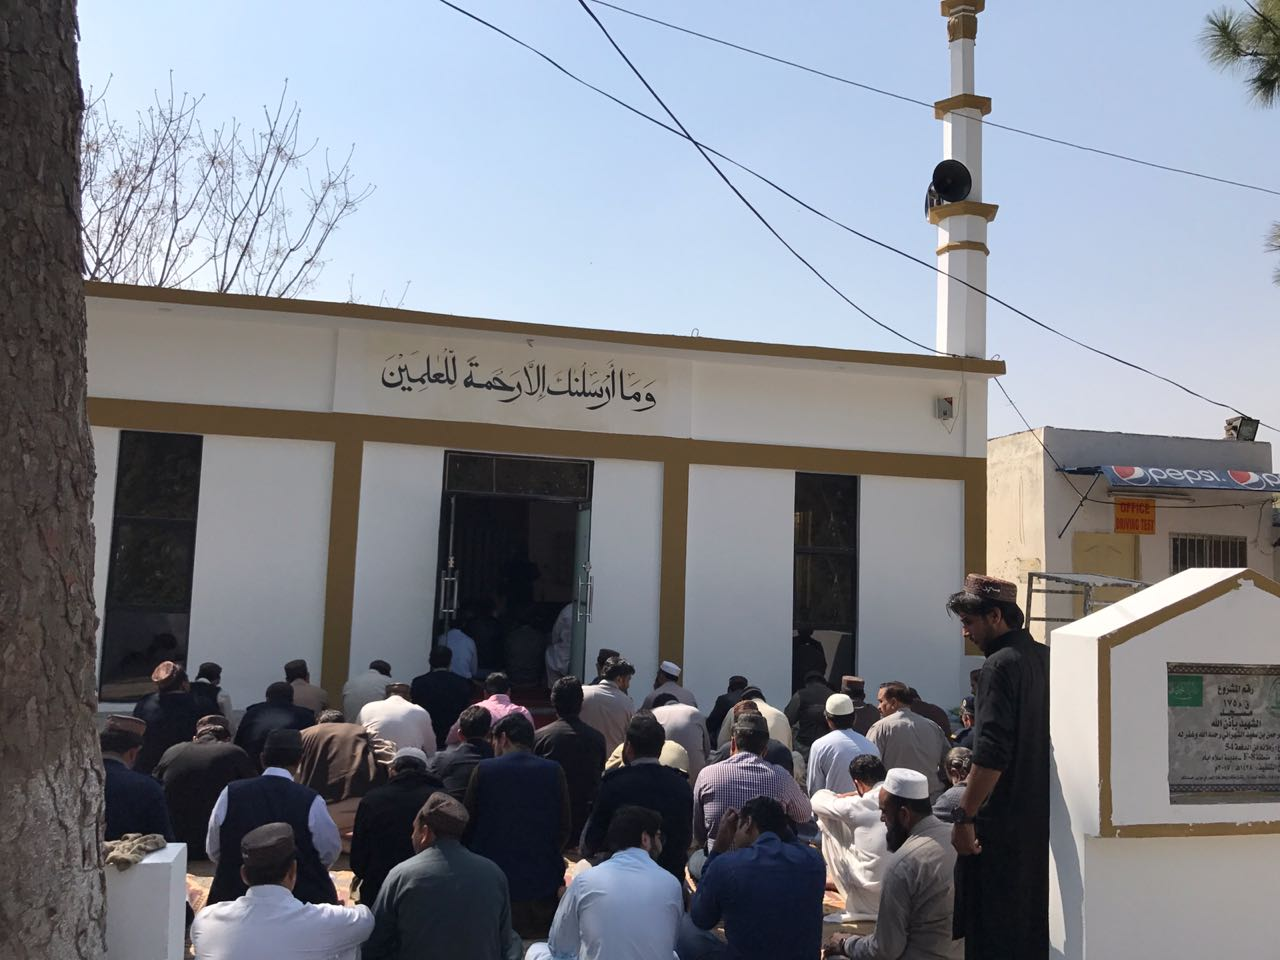 Photo of إفتتاح مسجد الشهيد عبدالرحمن سعيد الشهراني